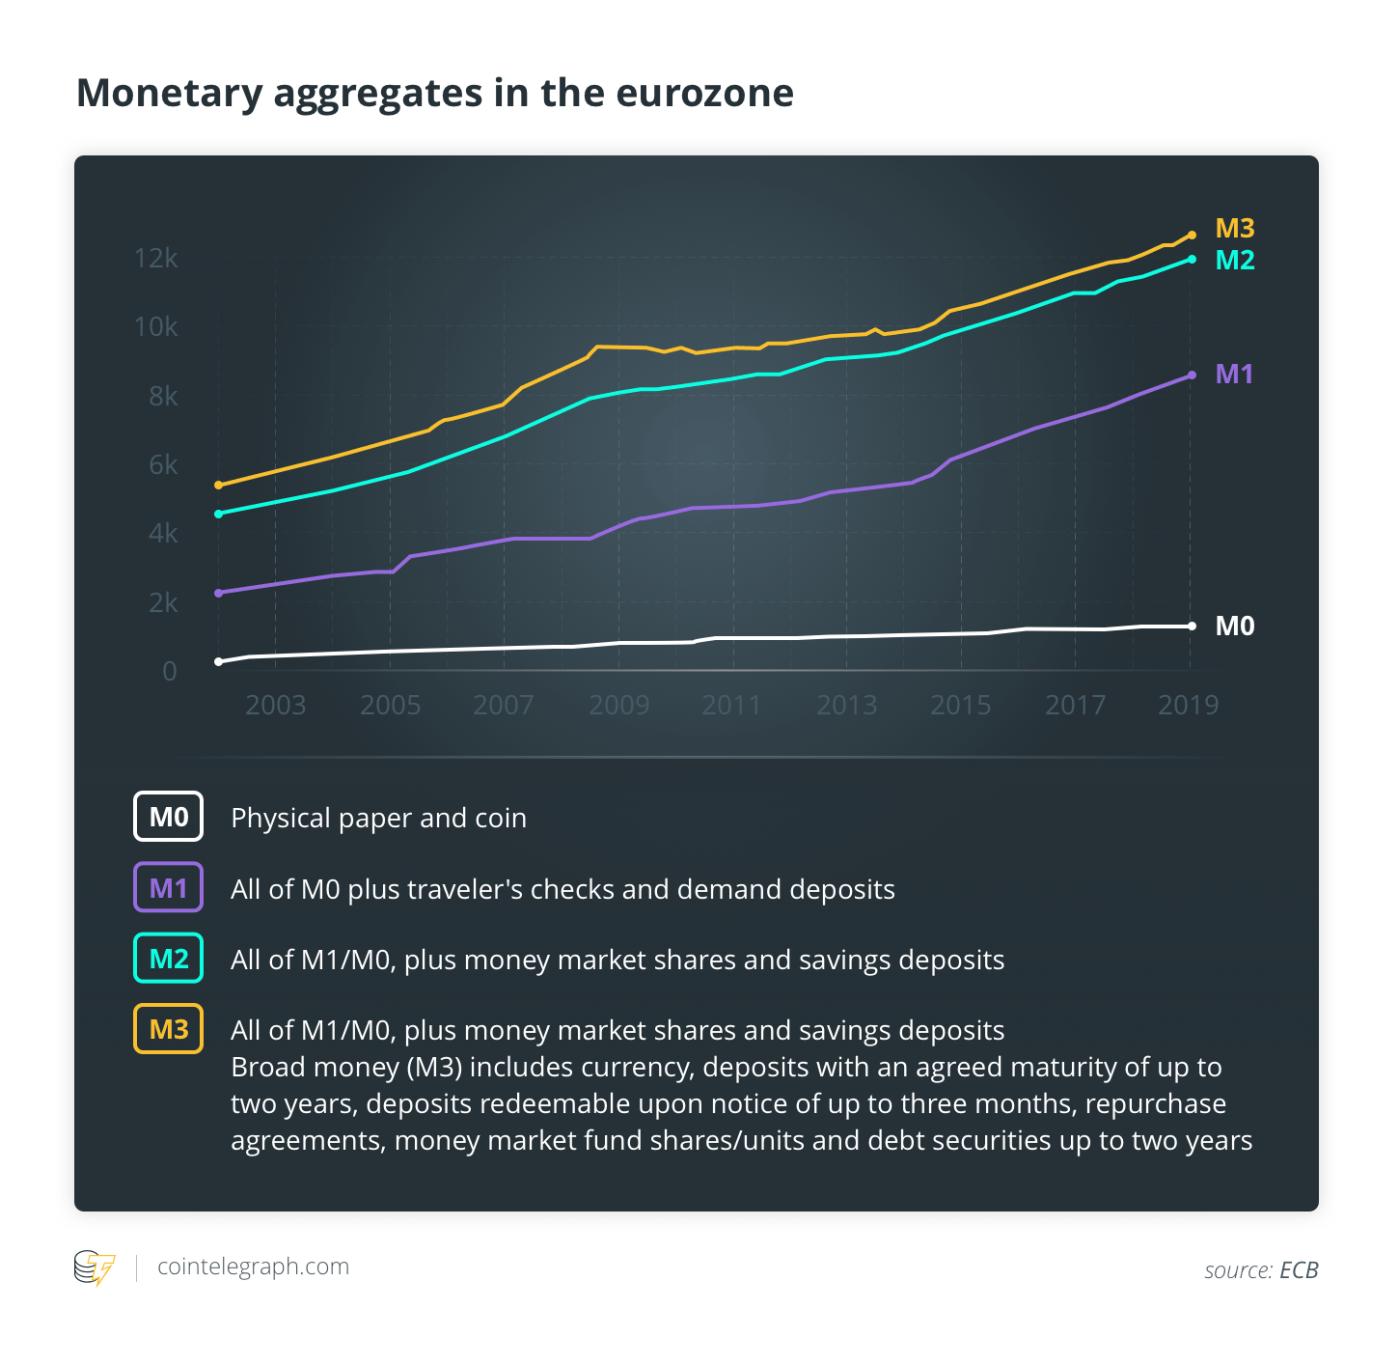 Monetary aggregates in the eurozone